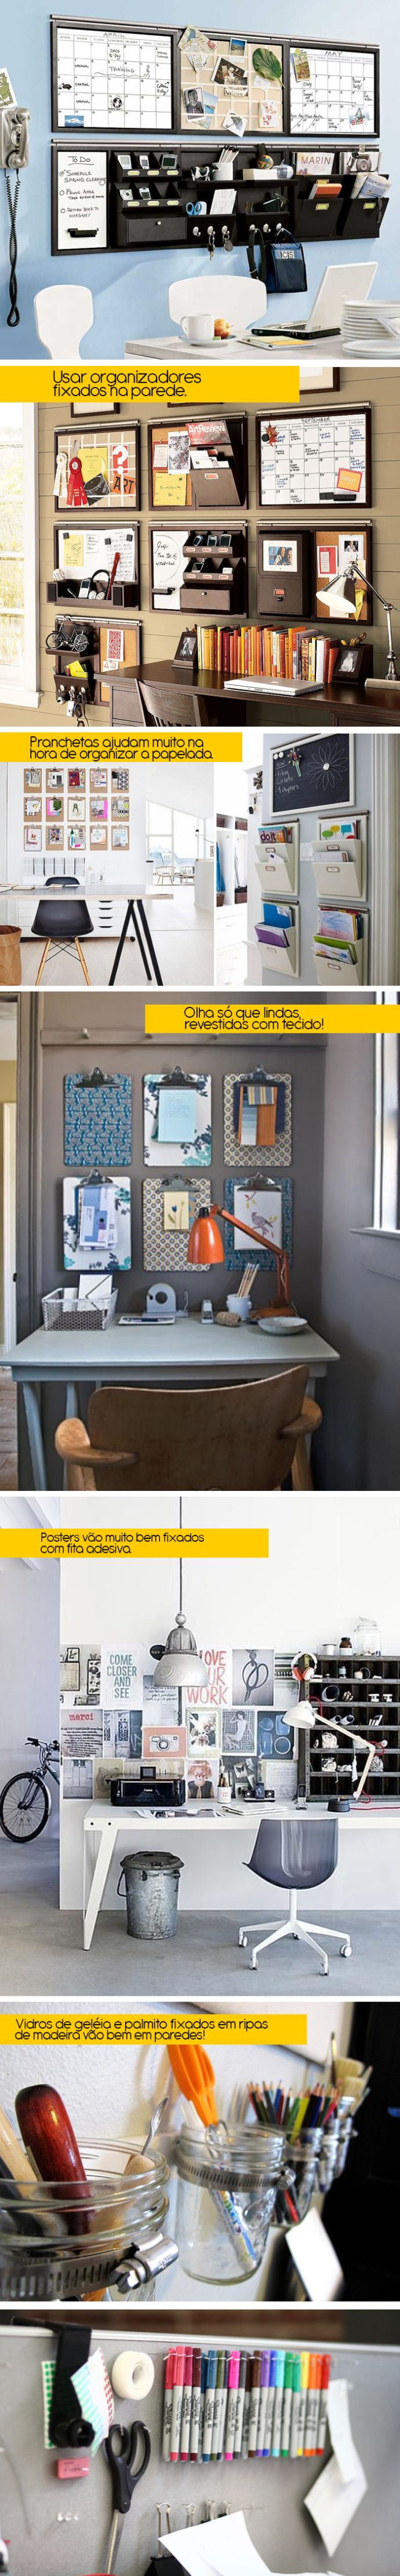 Como decorar gastando pouco Home offices escritrios  Bramare por Bia LombardiBramare por Bia Lombardi